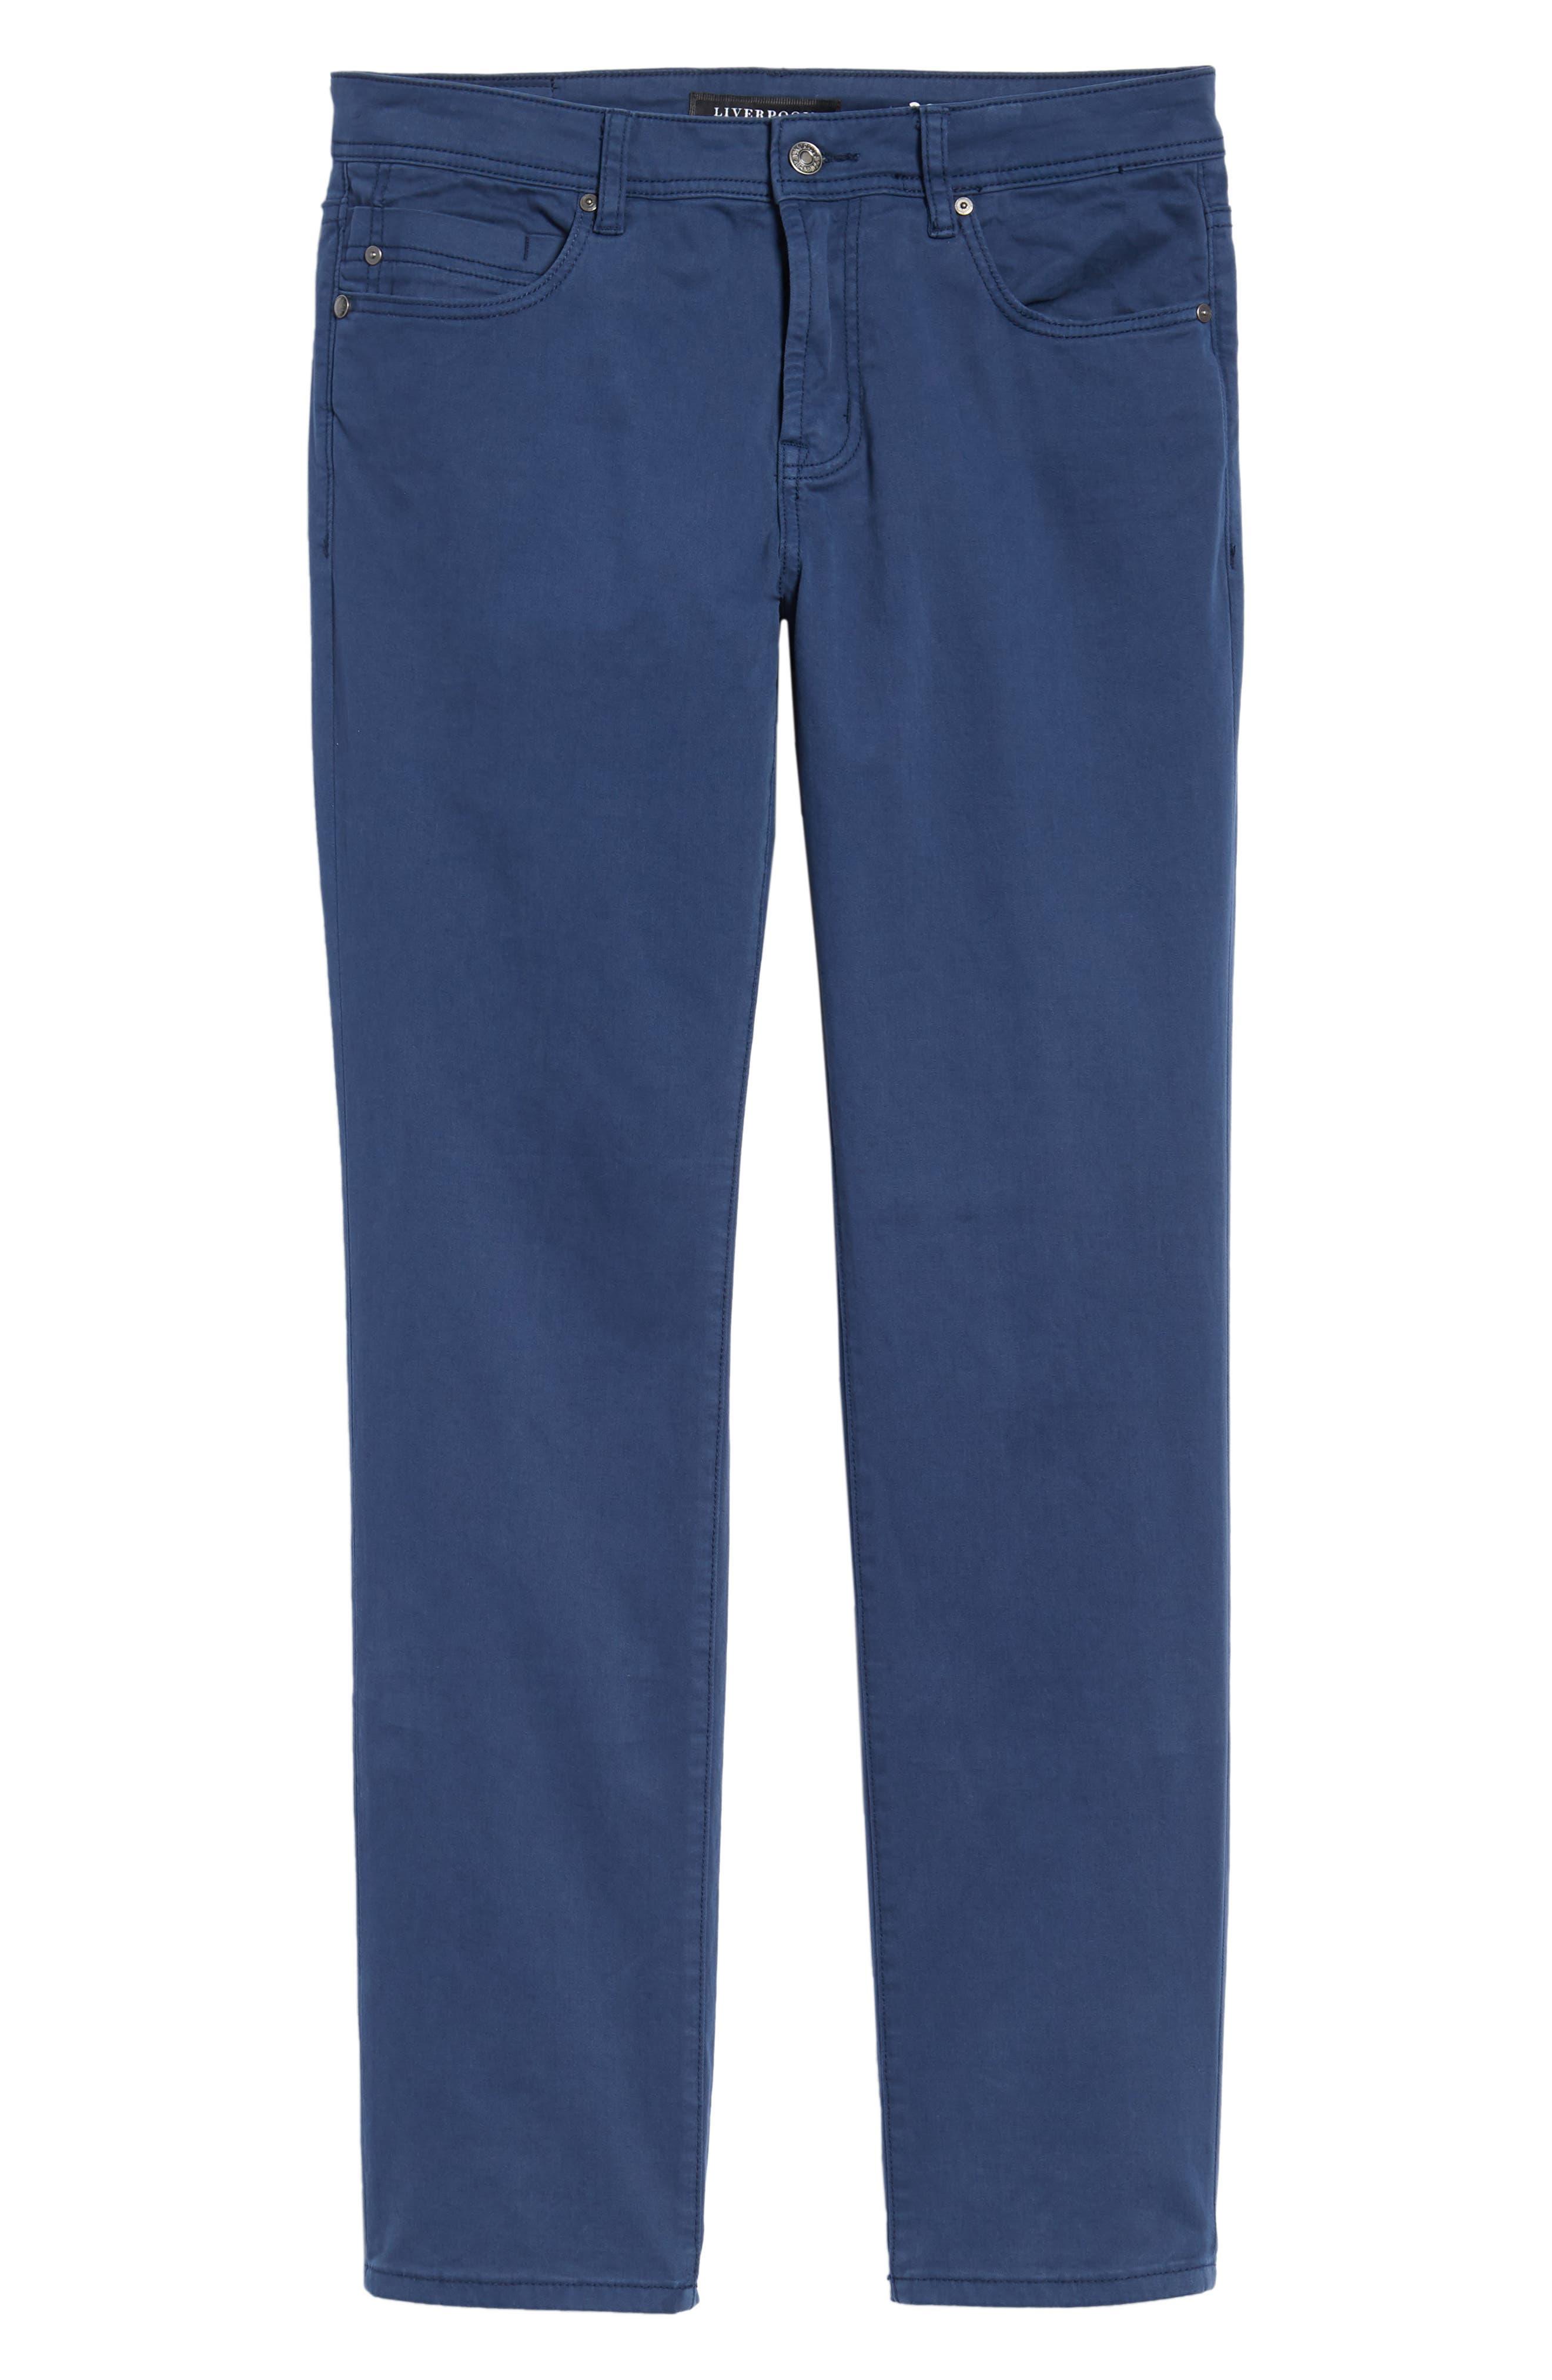 Jeans Co. Regent Relaxed Straight Leg Jeans,                             Alternate thumbnail 6, color,                             BLUE TWILIGHT